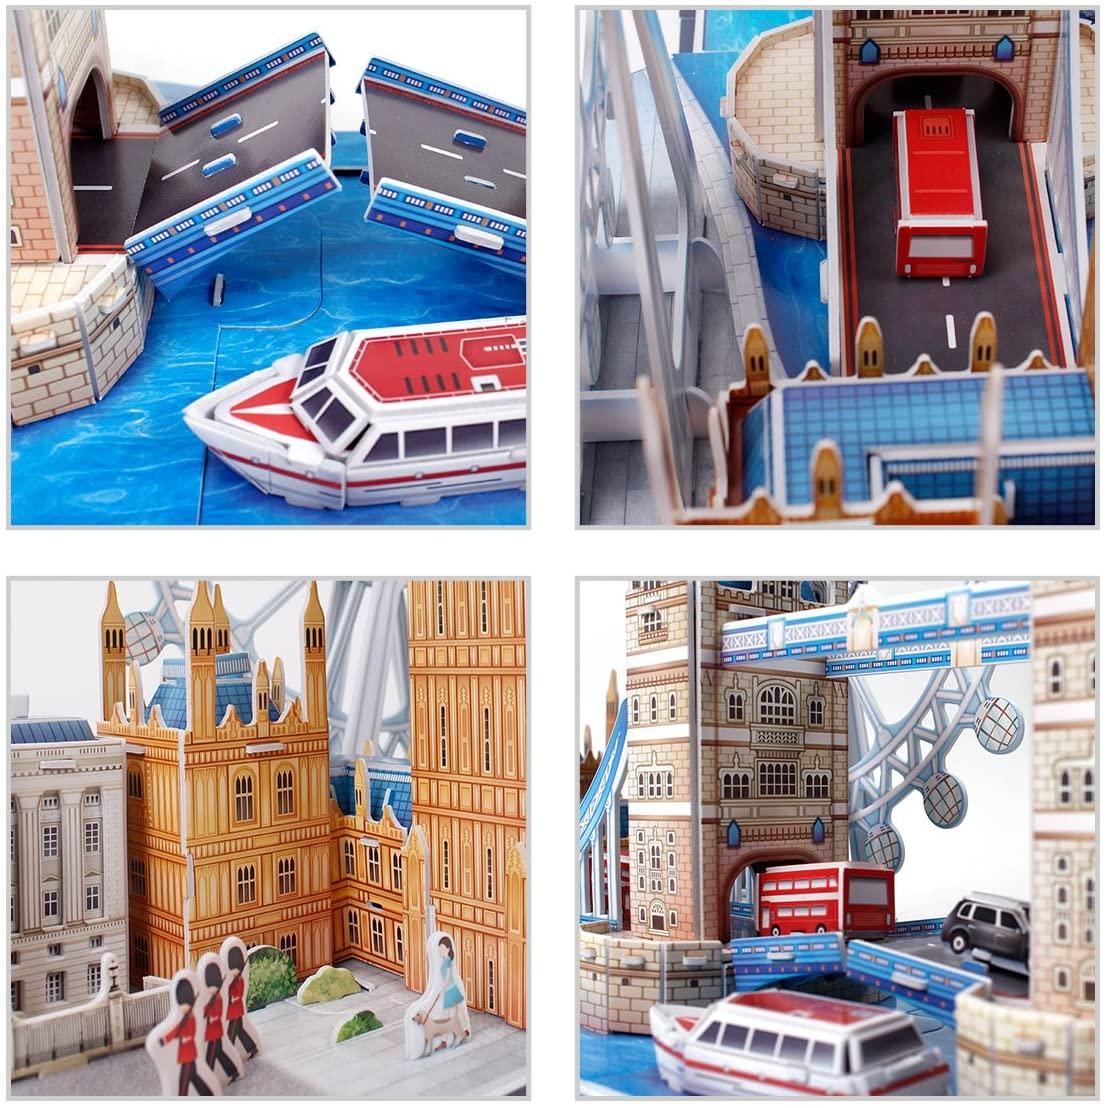 Quebra-cabeça 3D (3D Puzzle) Paisagens de Londres - Revell 00140  - BLIMPS COMÉRCIO ELETRÔNICO